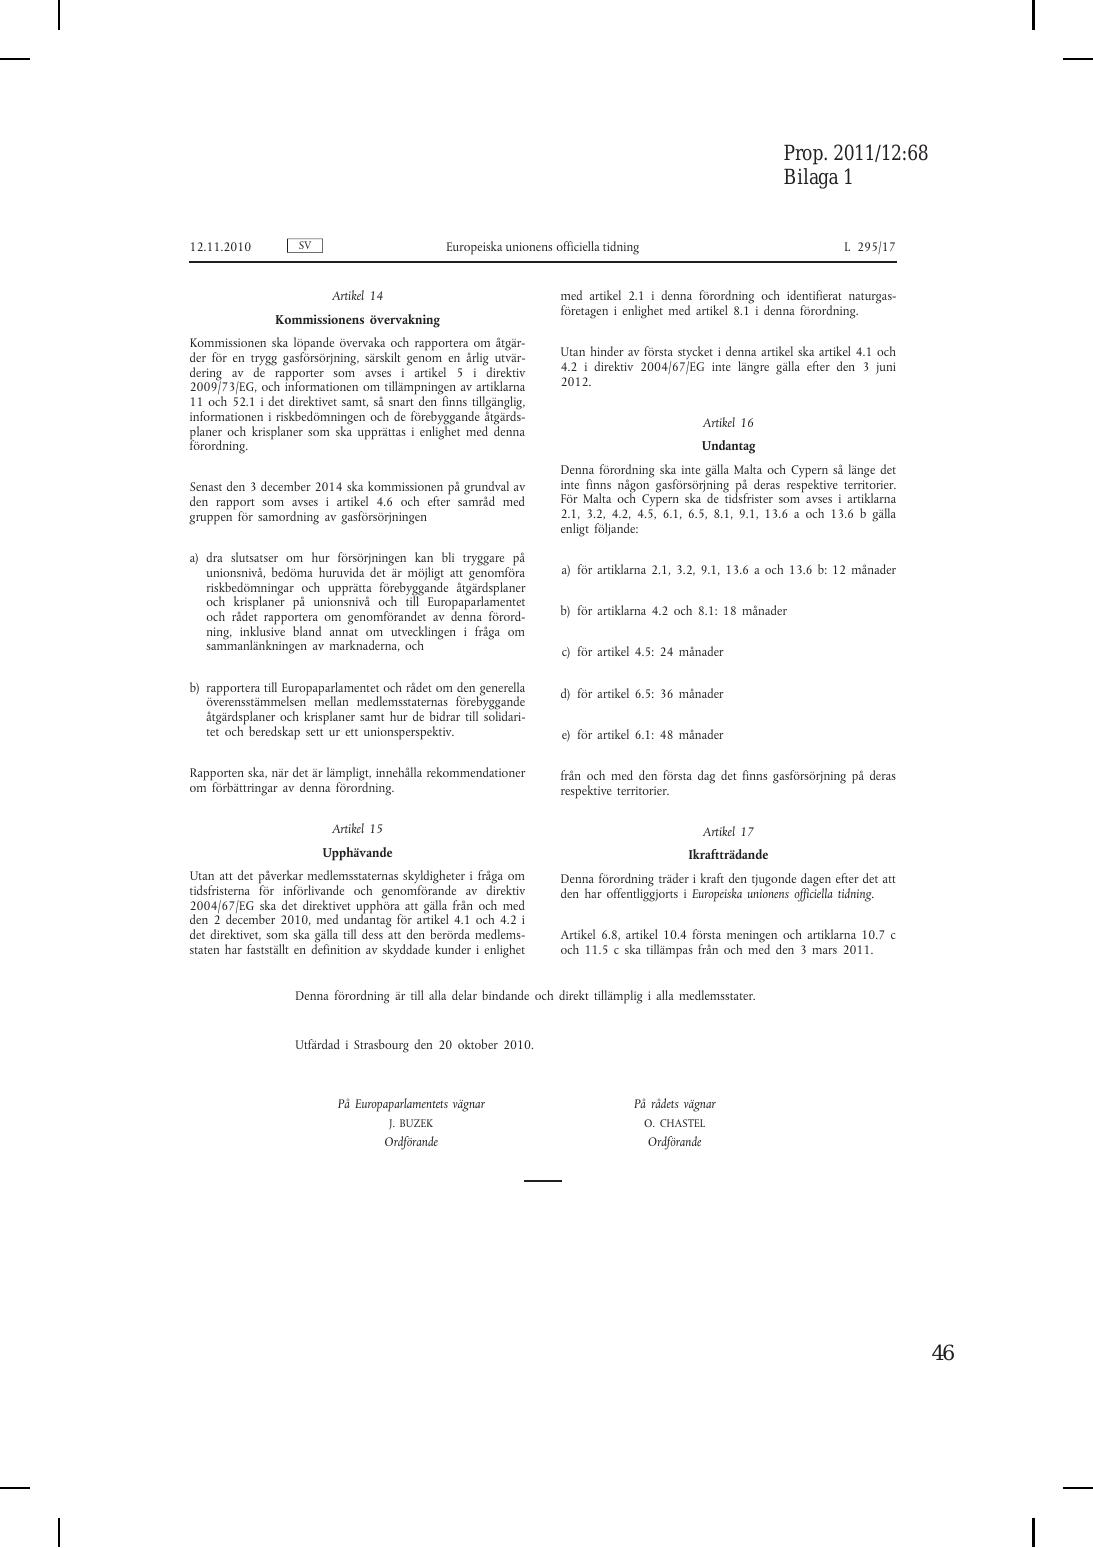 Portugals parlament antog krisplan